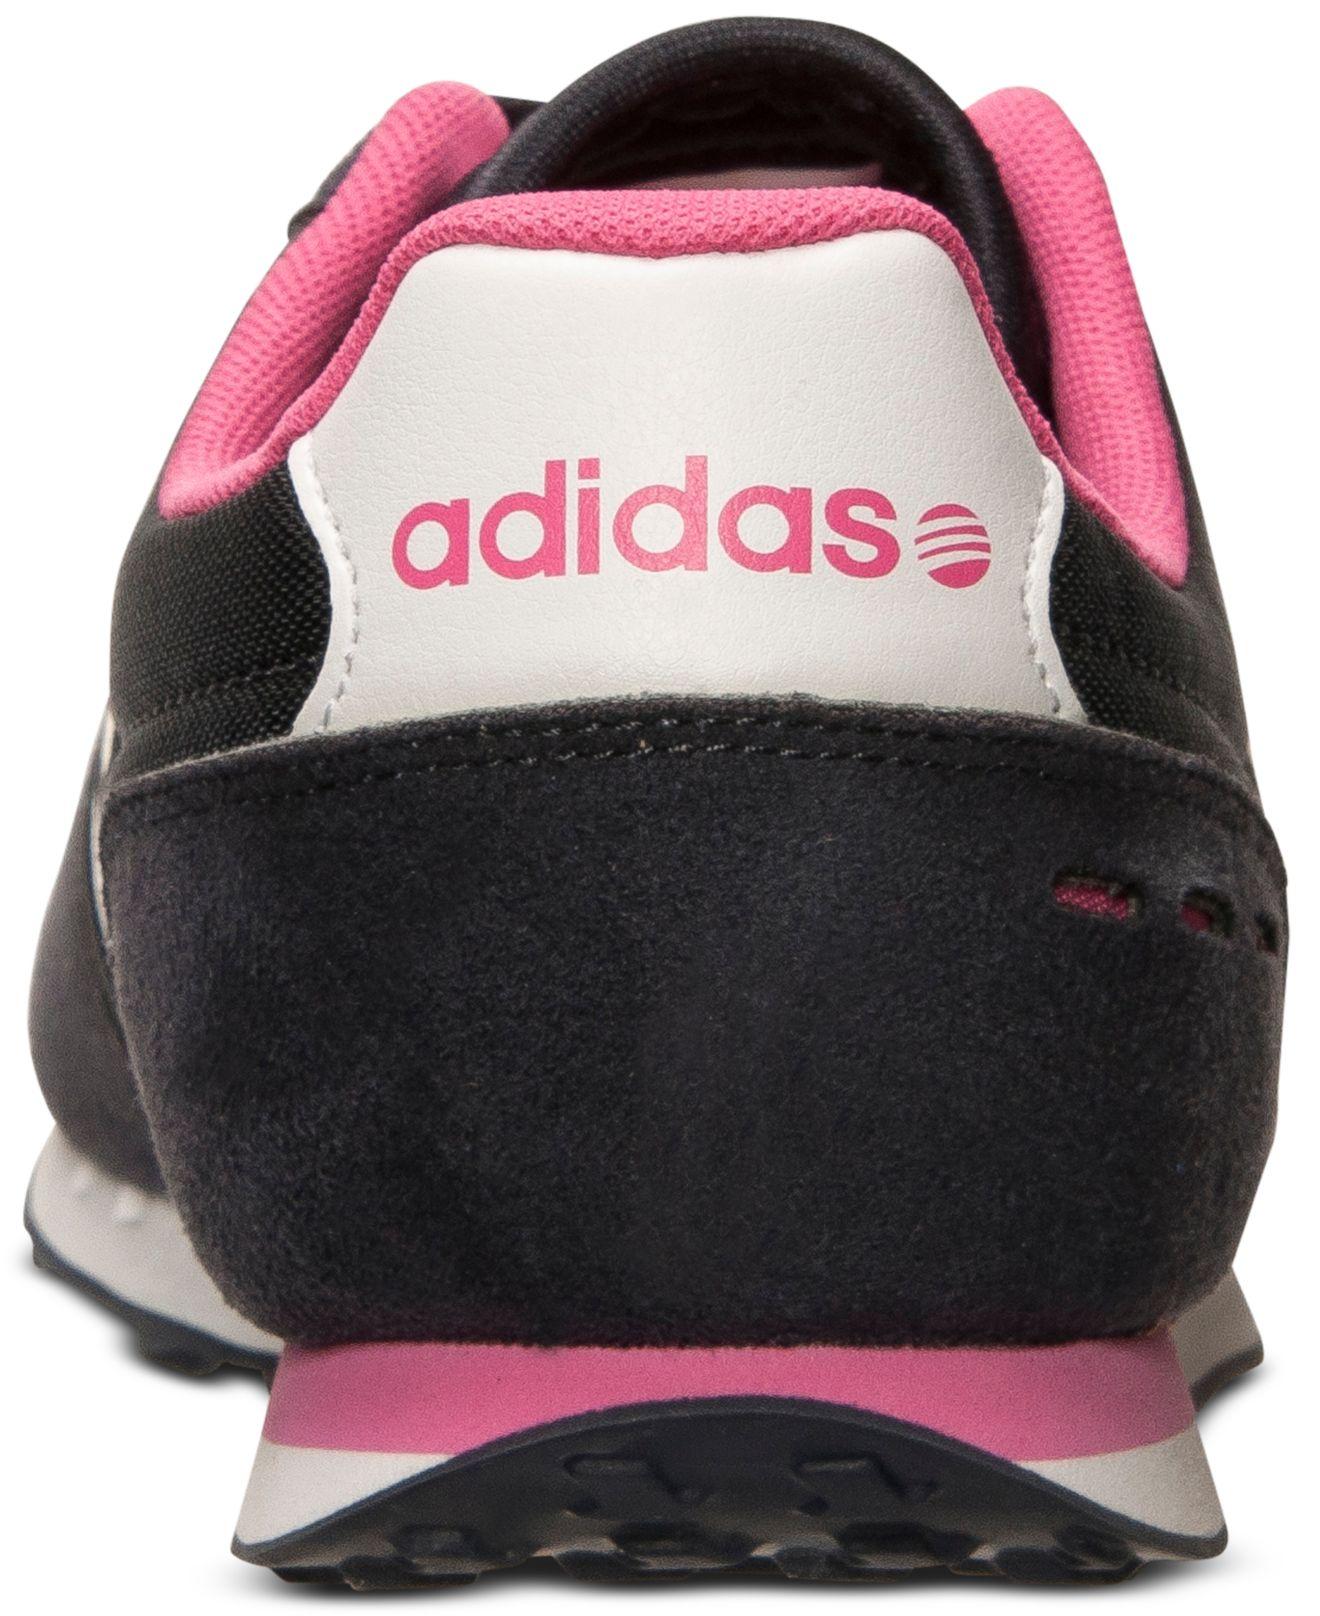 Adidas Neo City Racer Woman